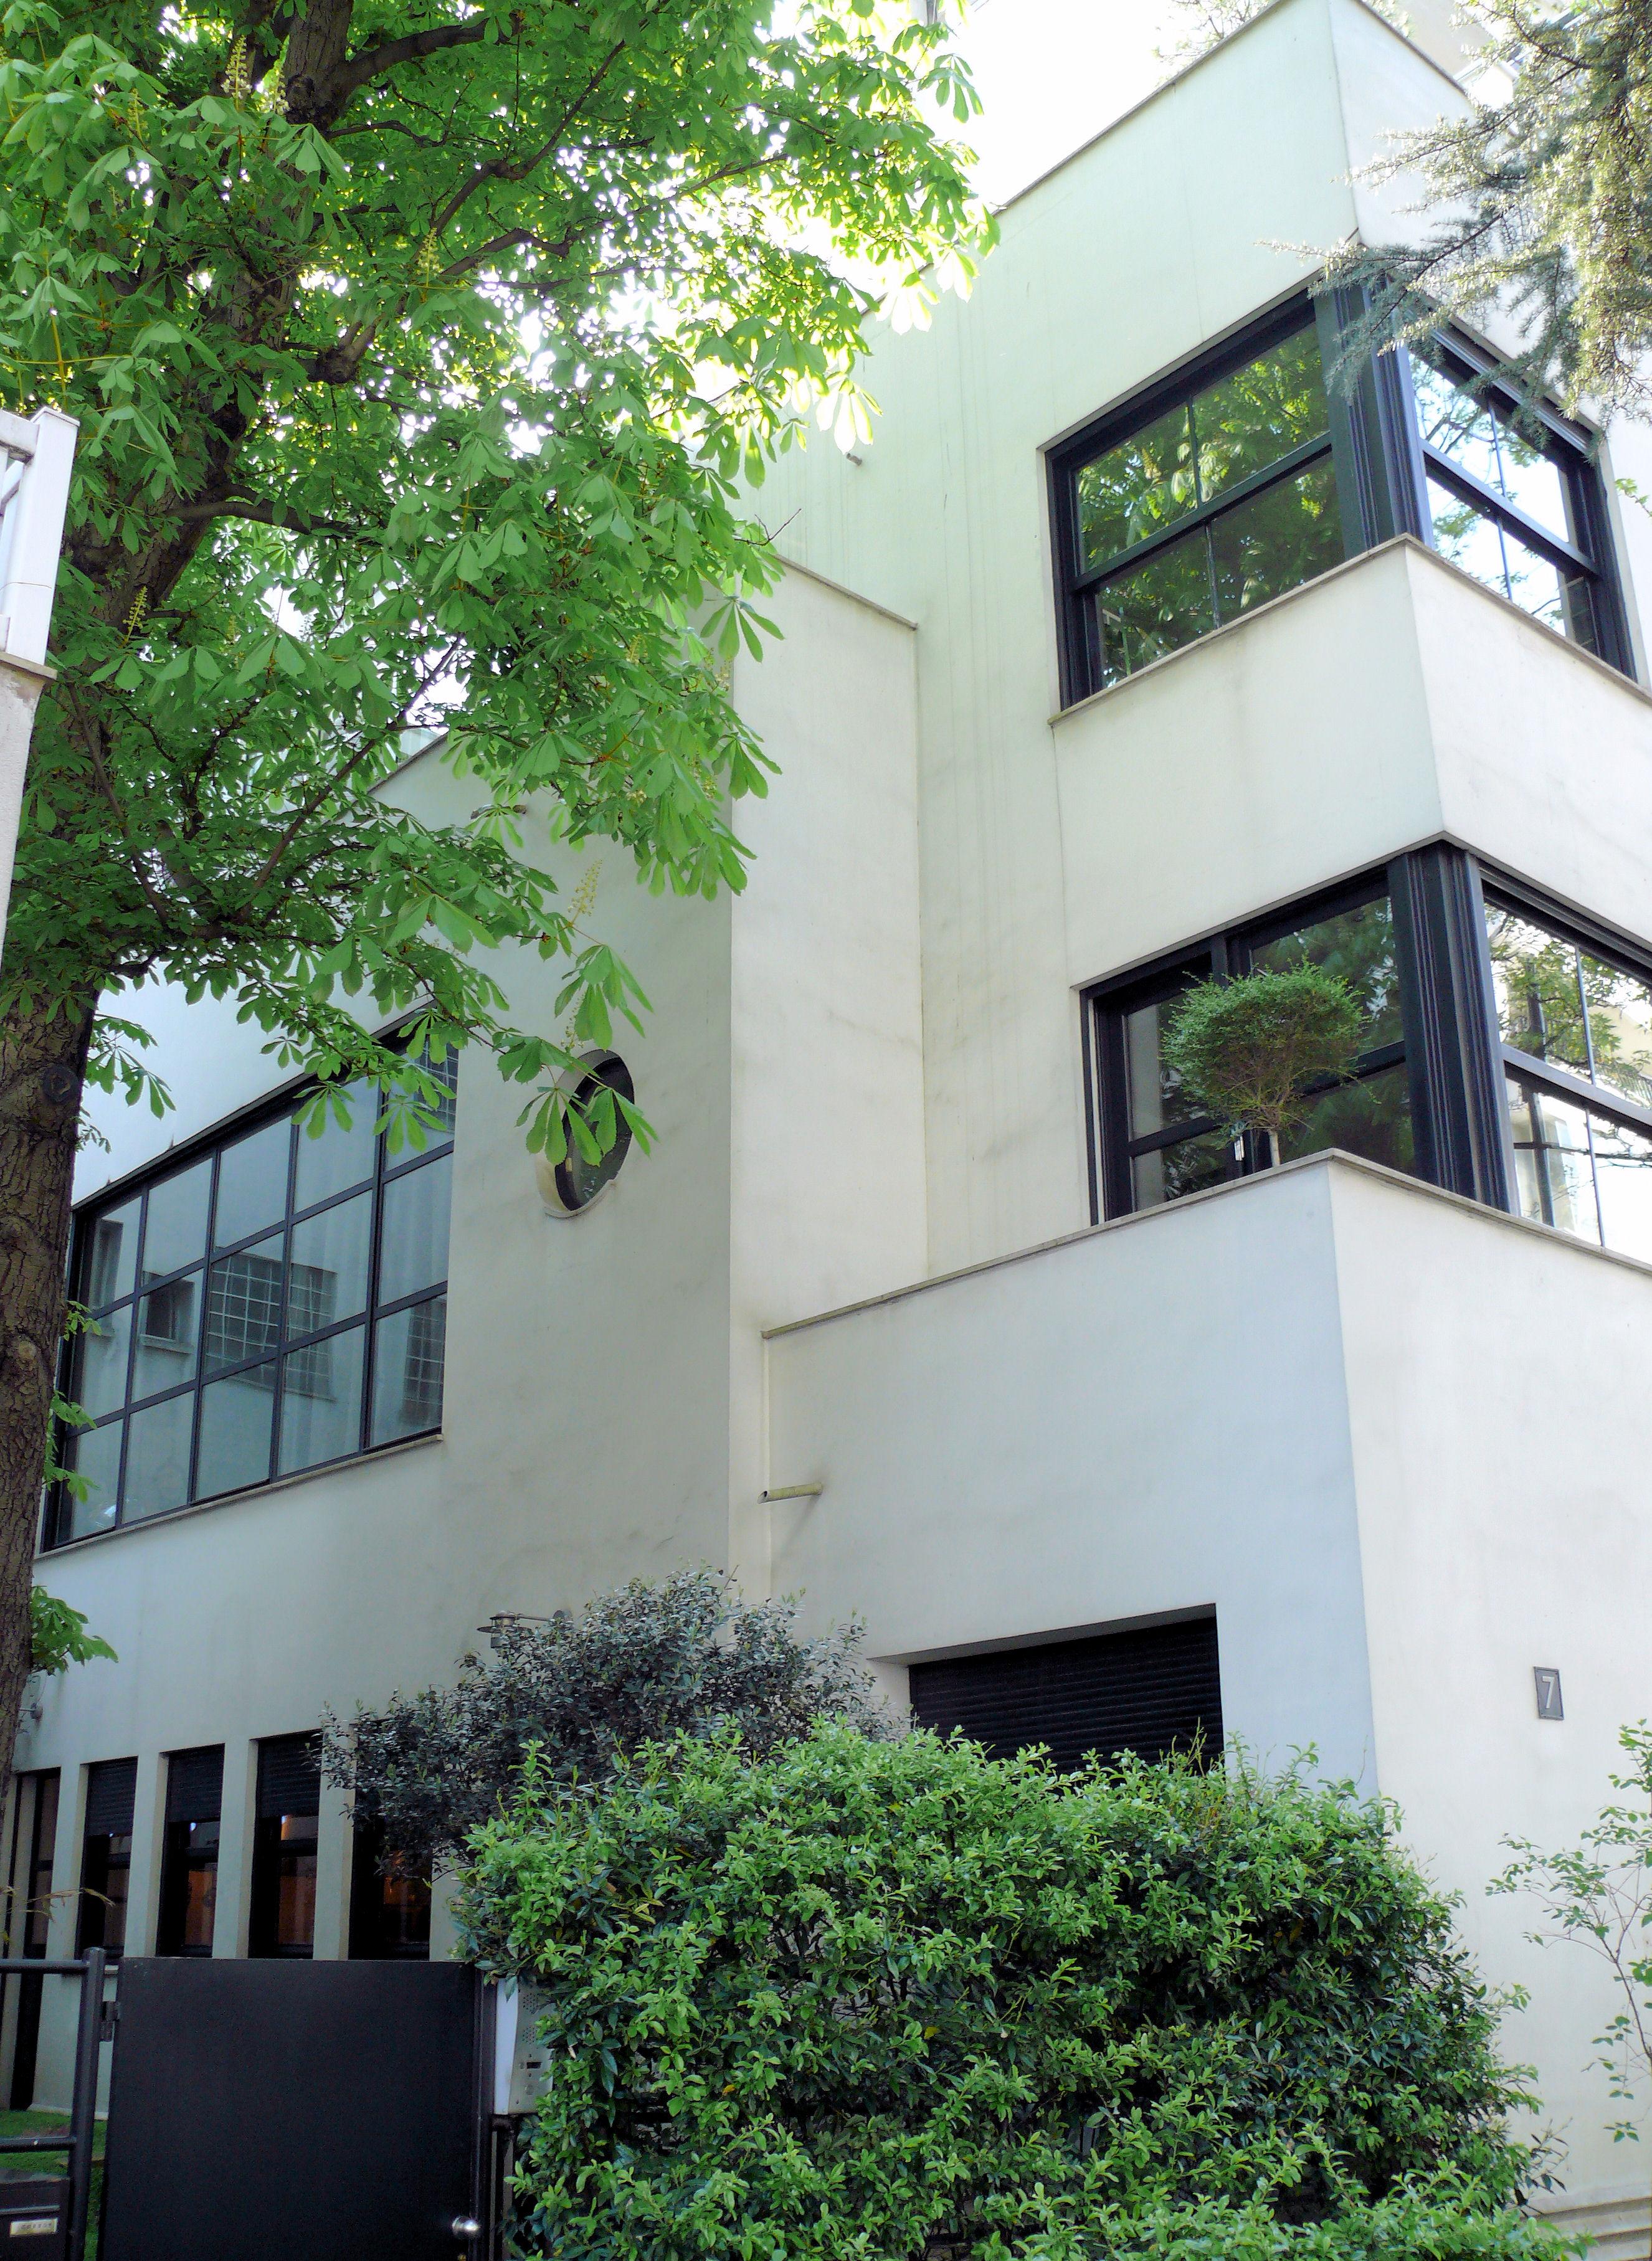 Très File:Paris 16 - Maison 7 rue Mallet-Stevens -1.JPG - Wikimedia Commons NL26